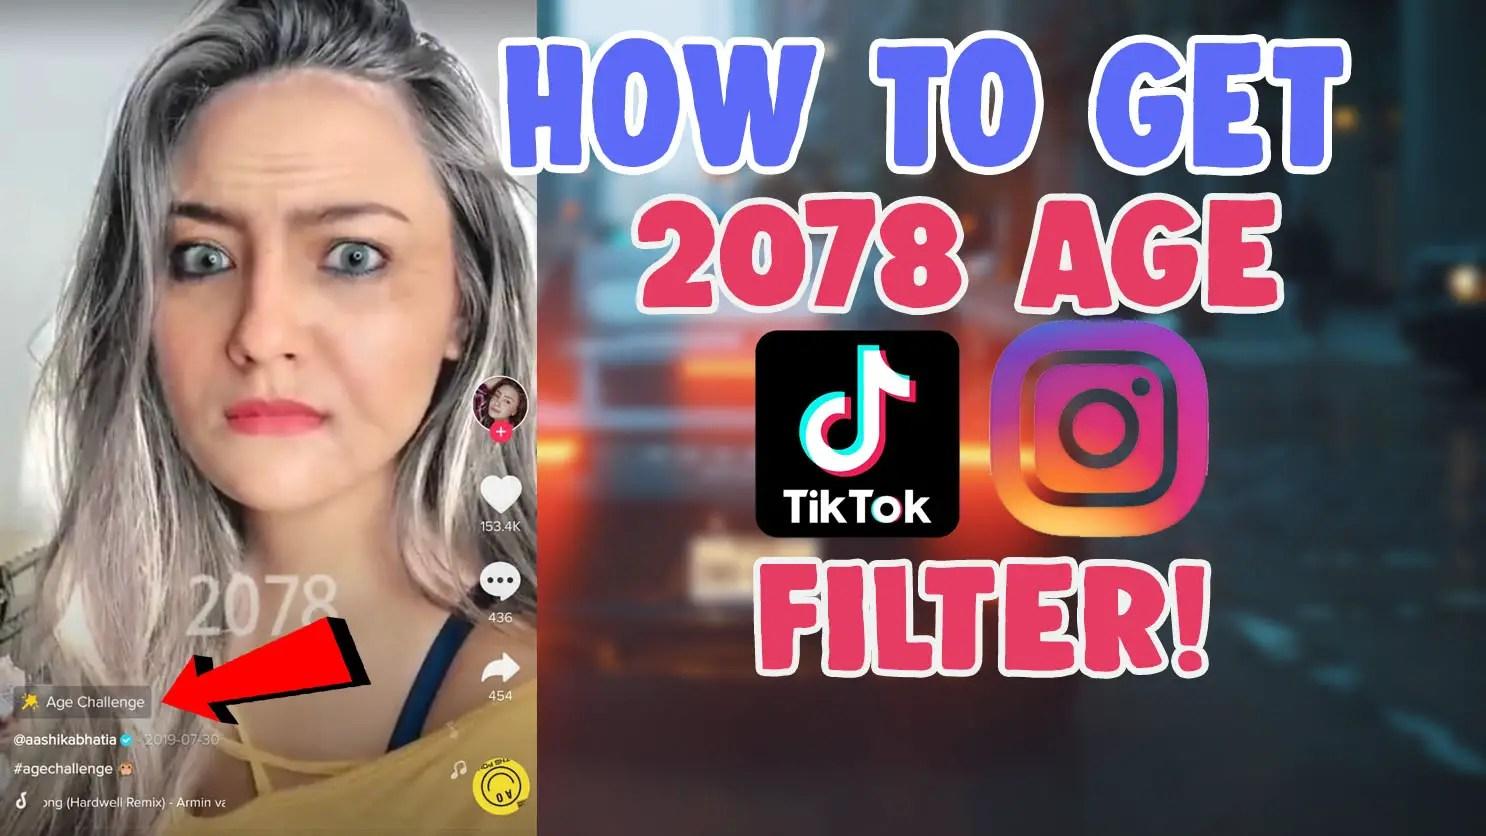 old aging face 2078 filter tiktok instagram snapchat